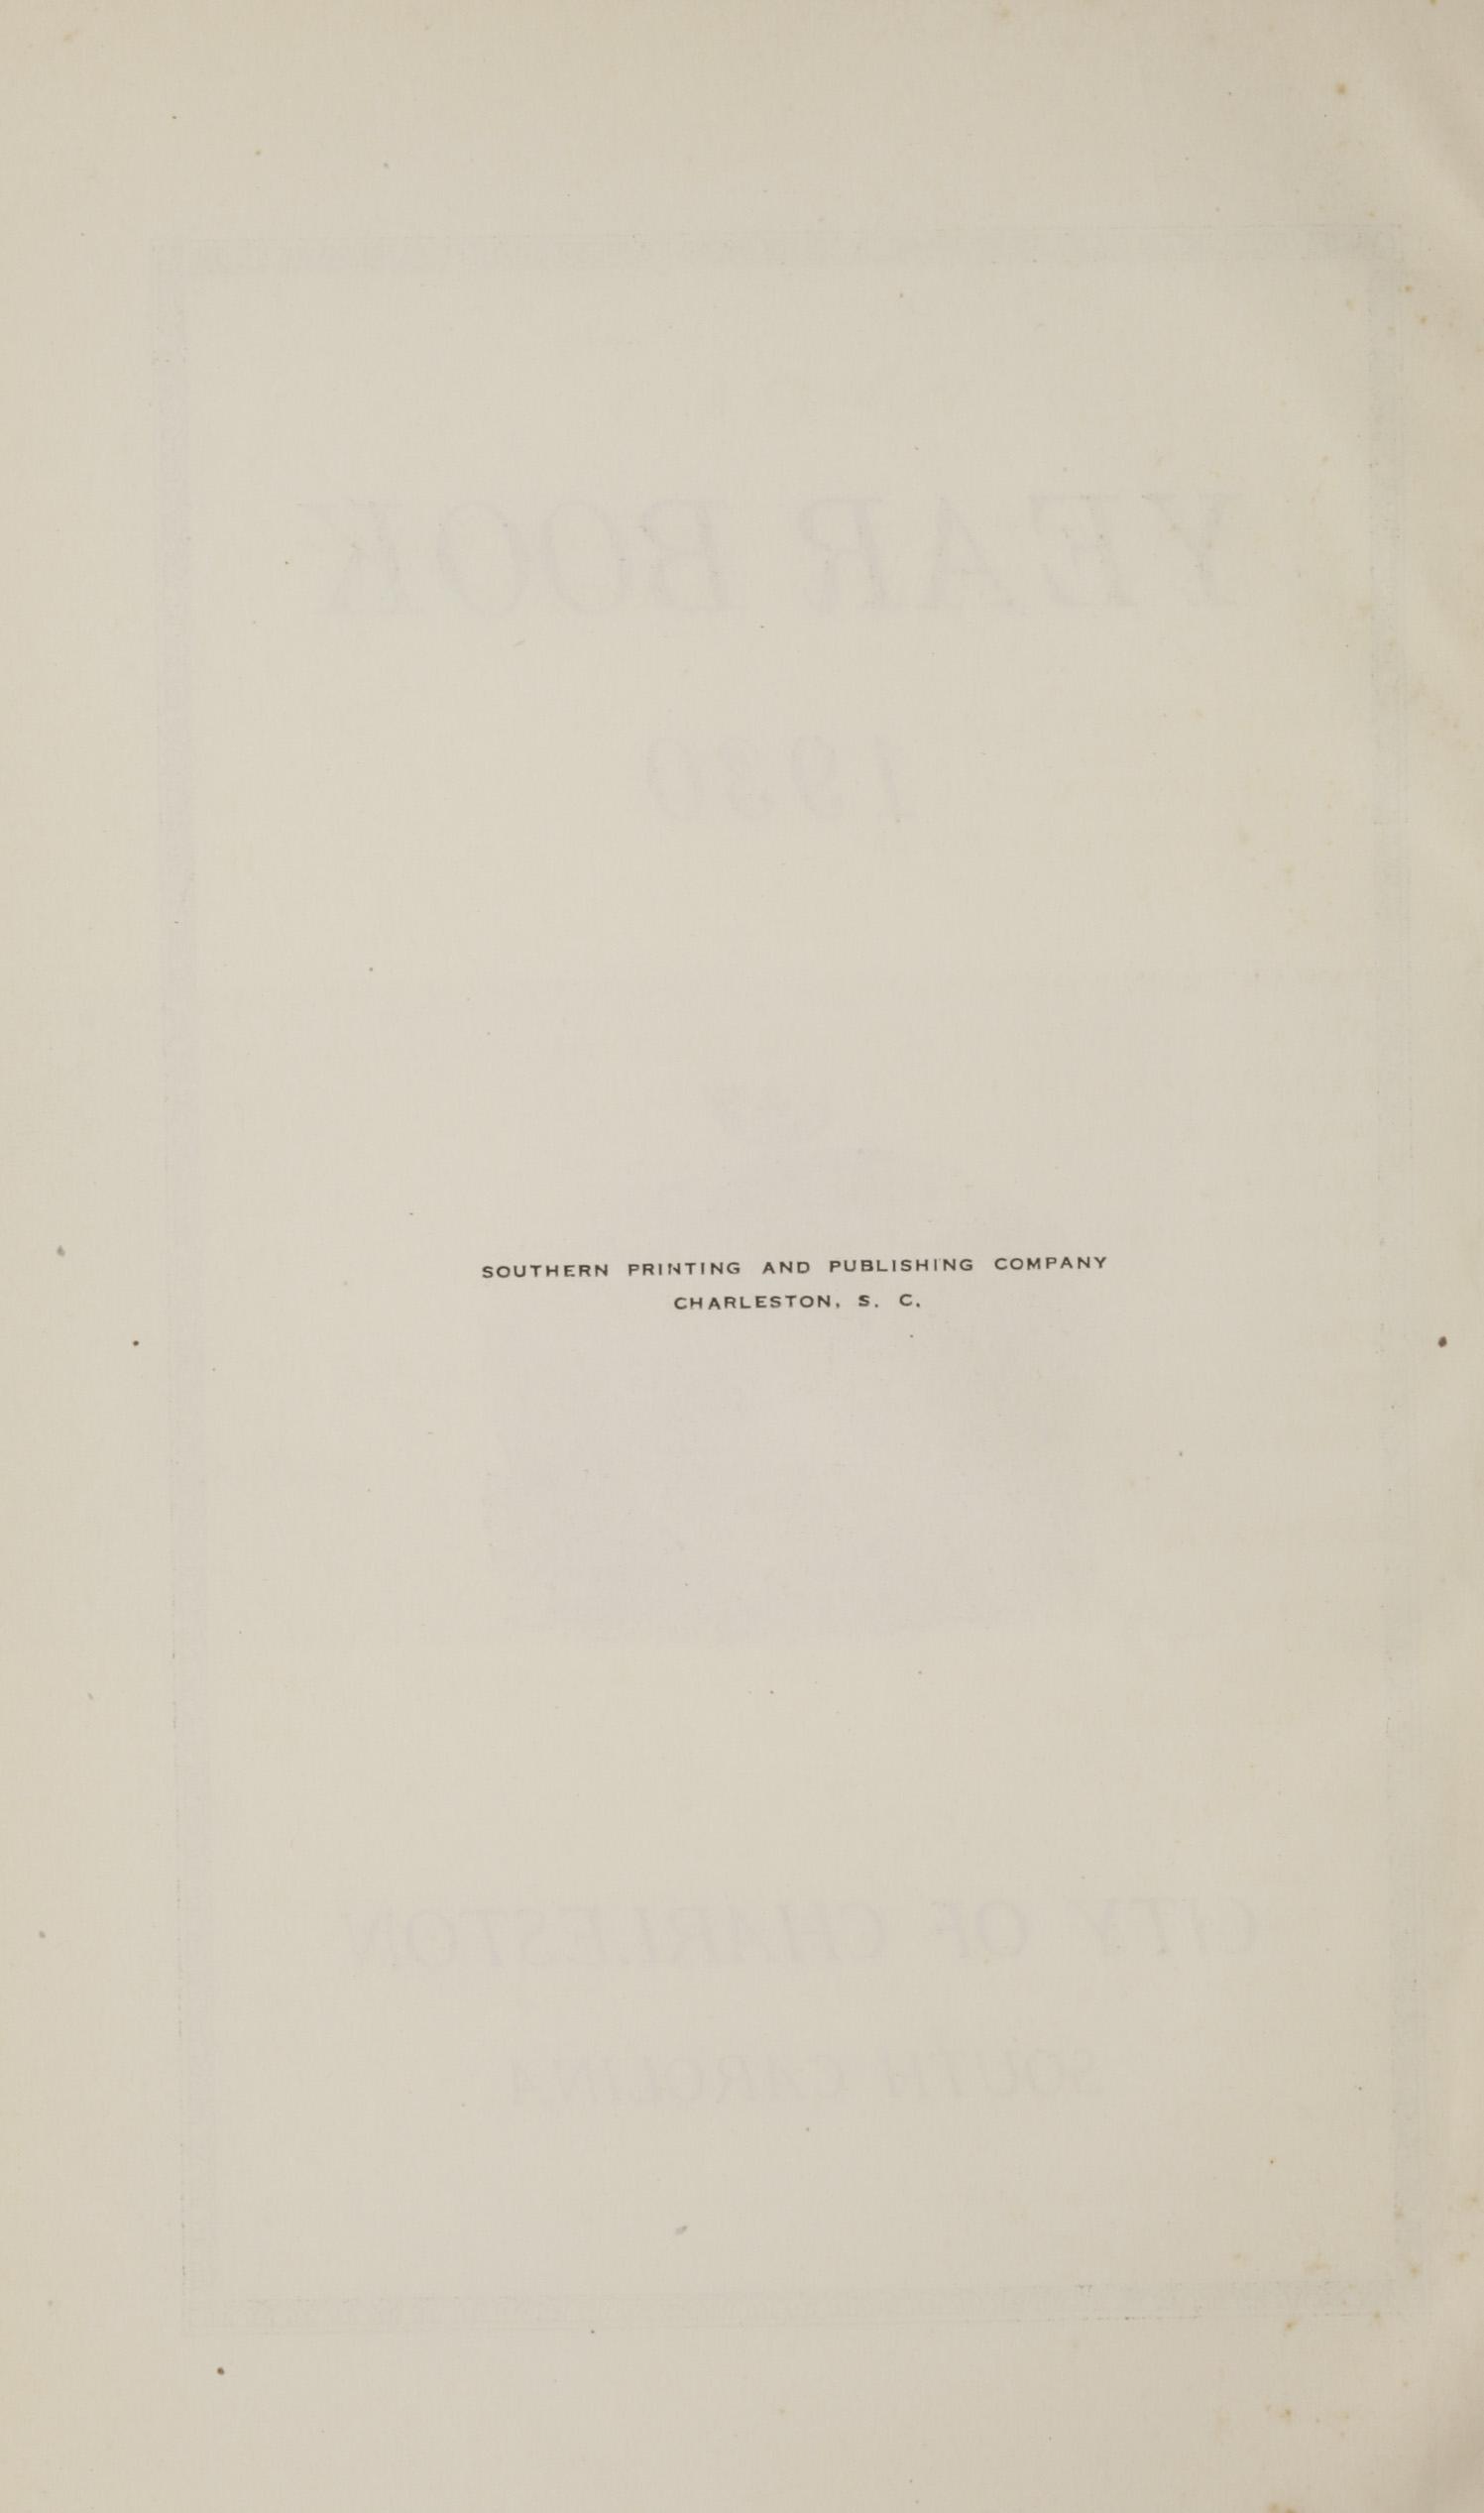 Charleston Yearbook, 1930, page ii